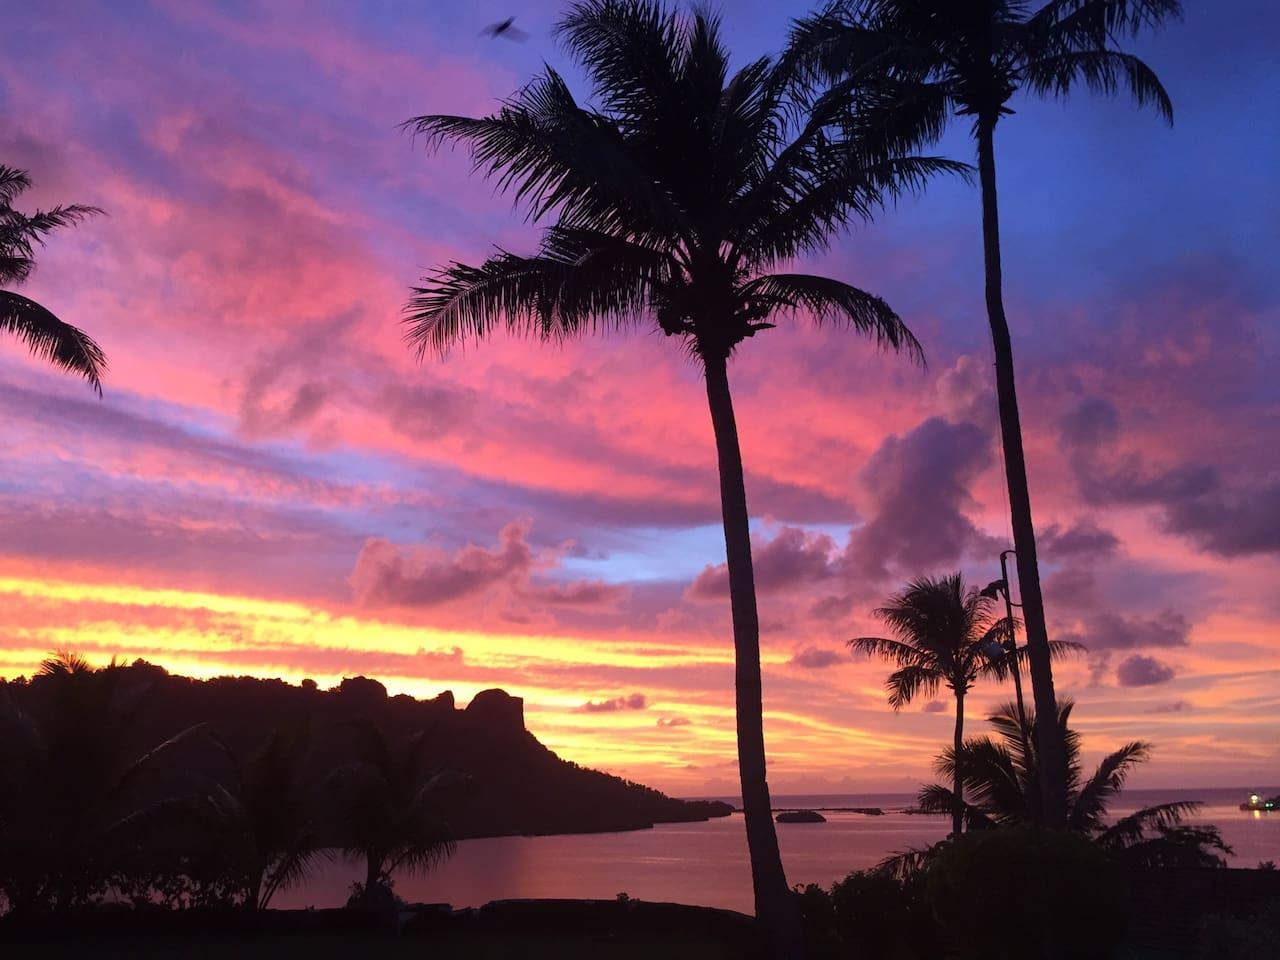 Sunset view  夕焼け